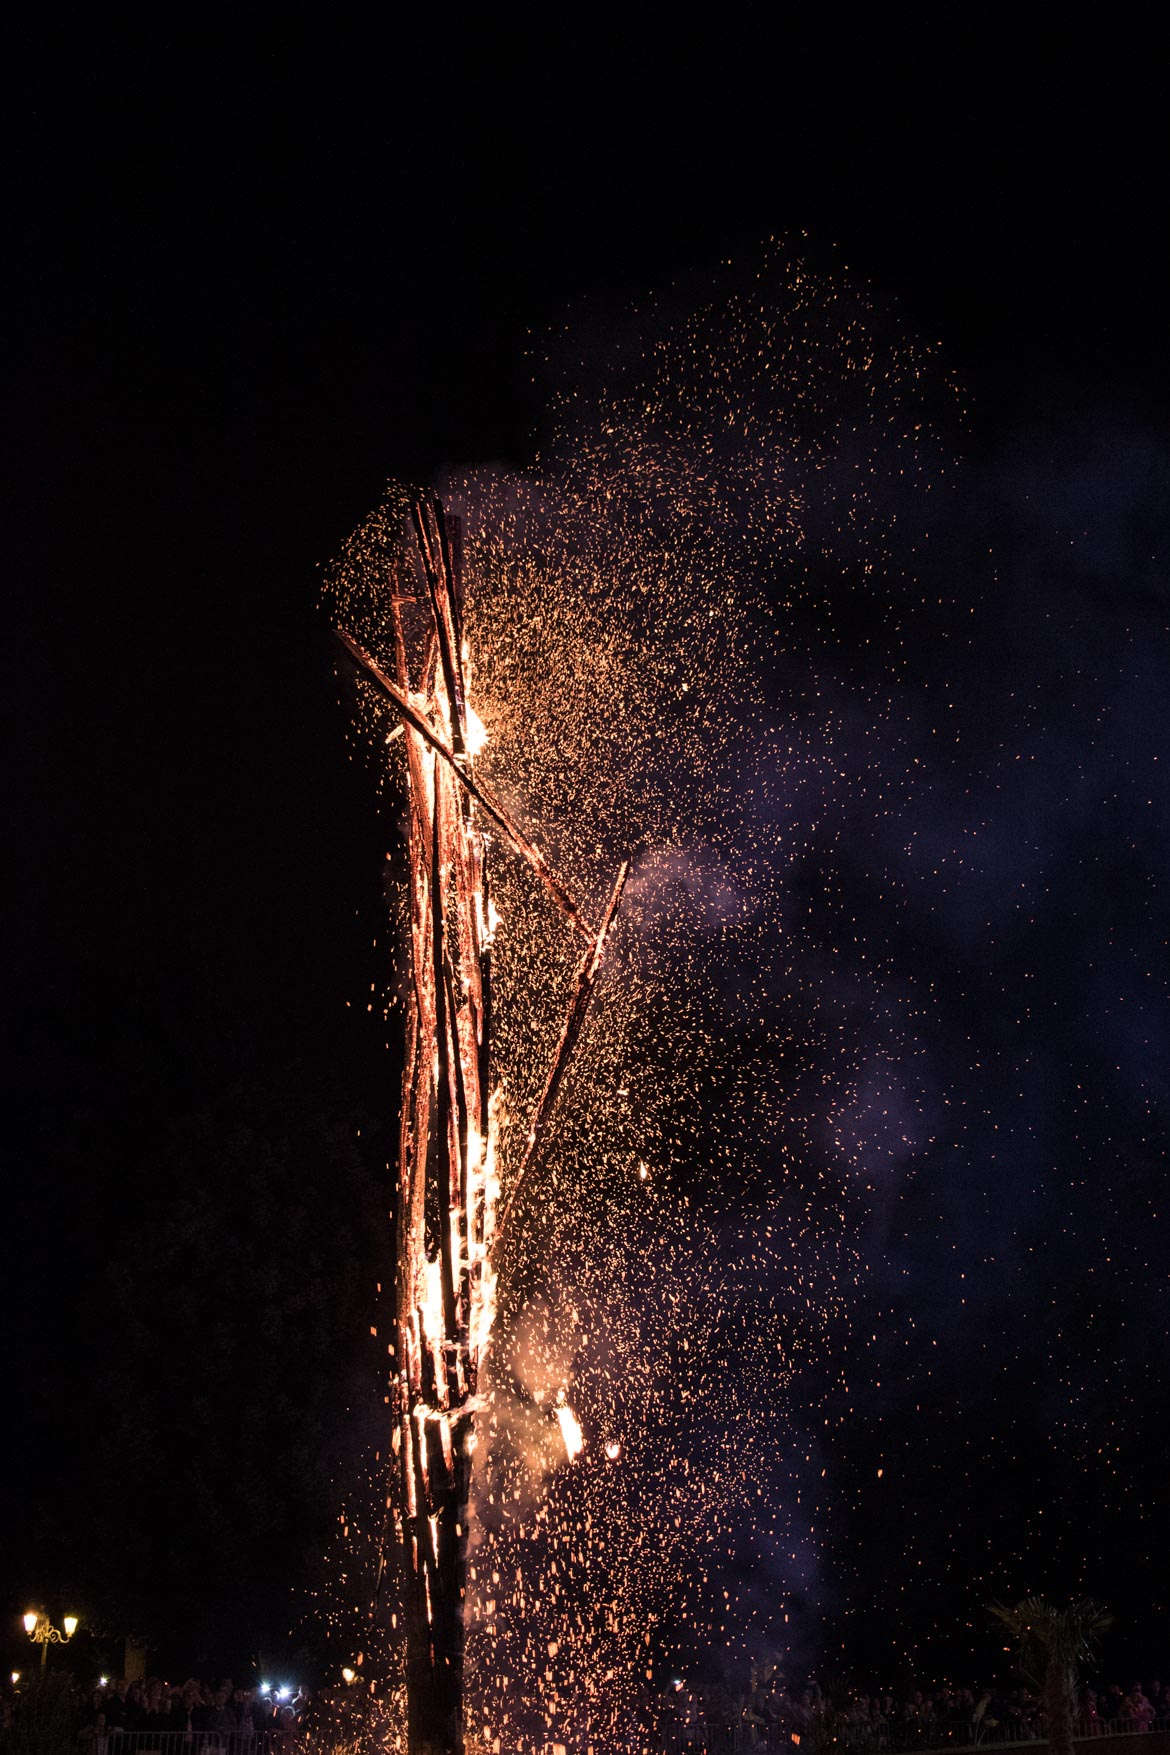 luchon pyrennees brandon saint jean